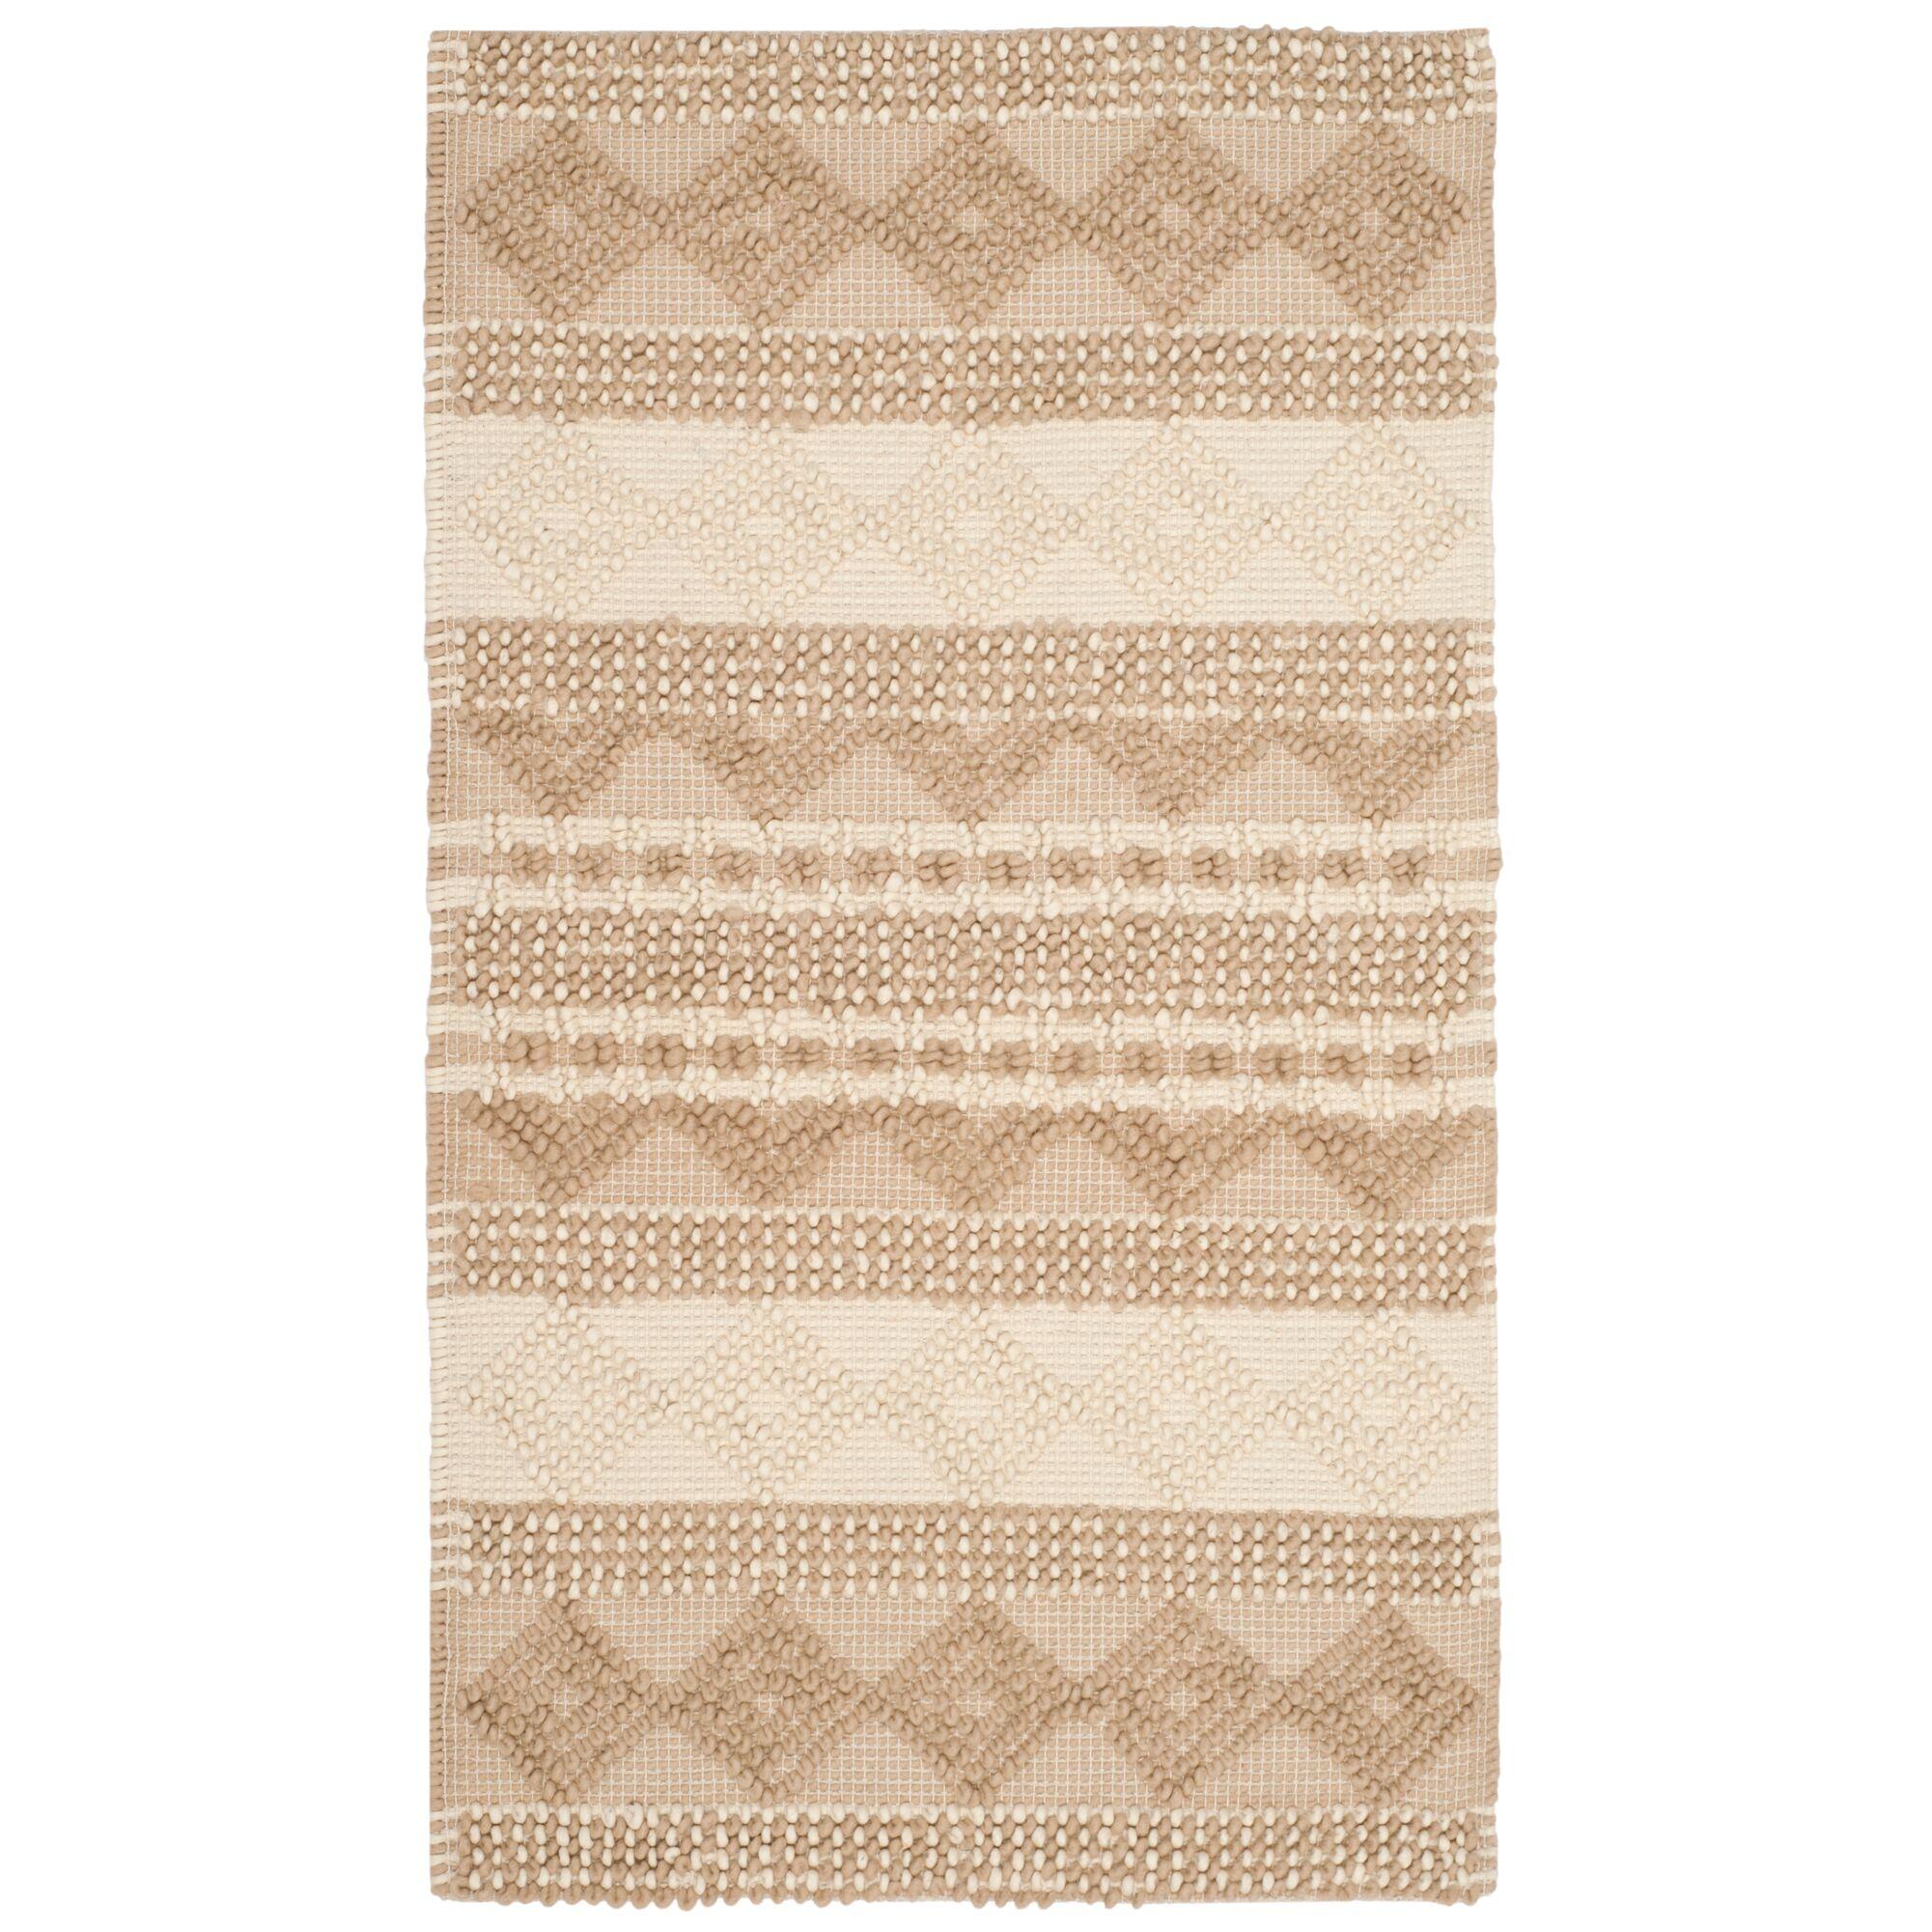 Billie Hand-Tufted Beige/Ivory Area Rug Rug Size: Rectangle 3' x 5'